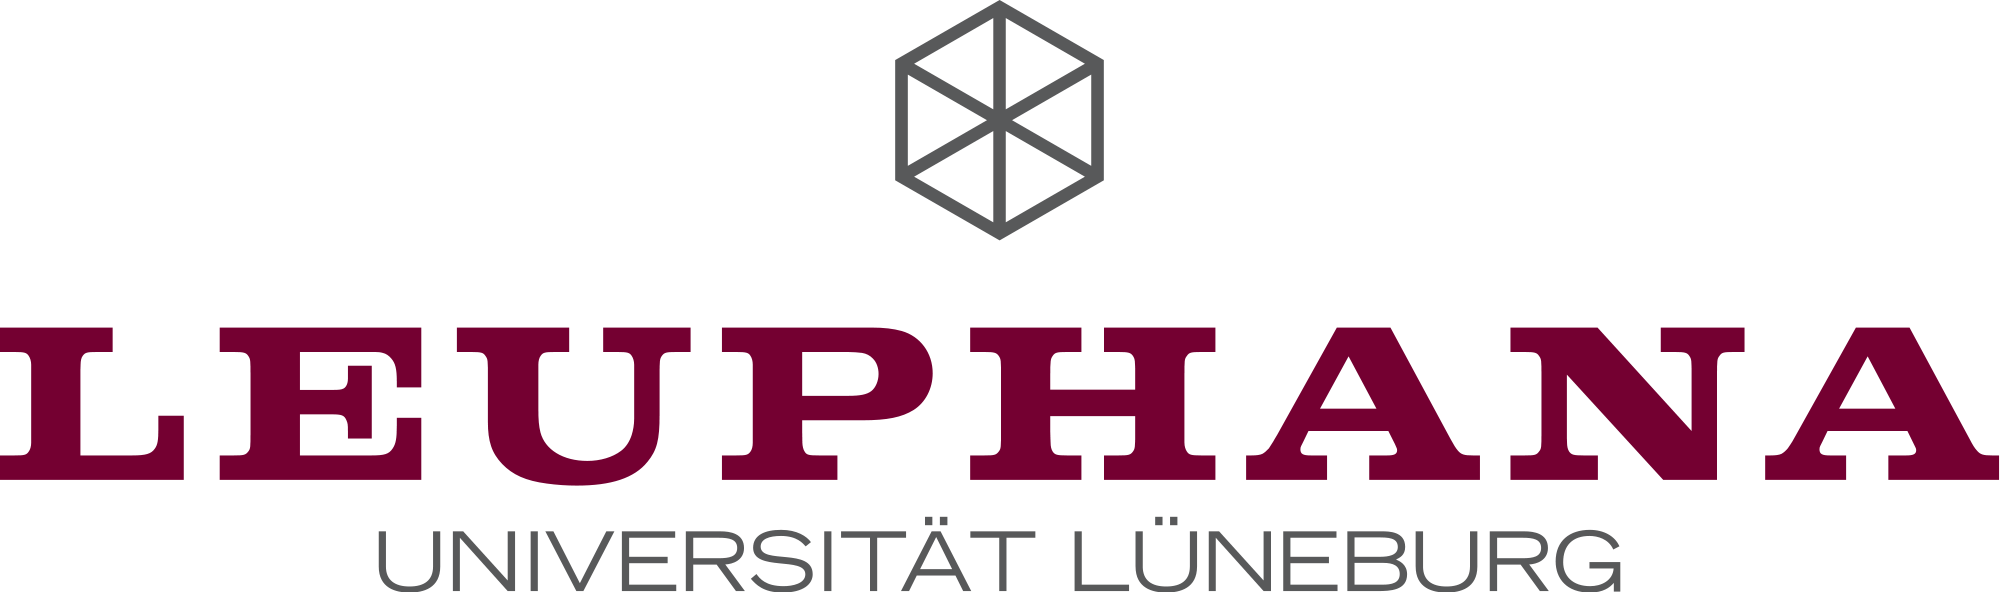 Logo-Leuphana_Uni_Lueneburg_04